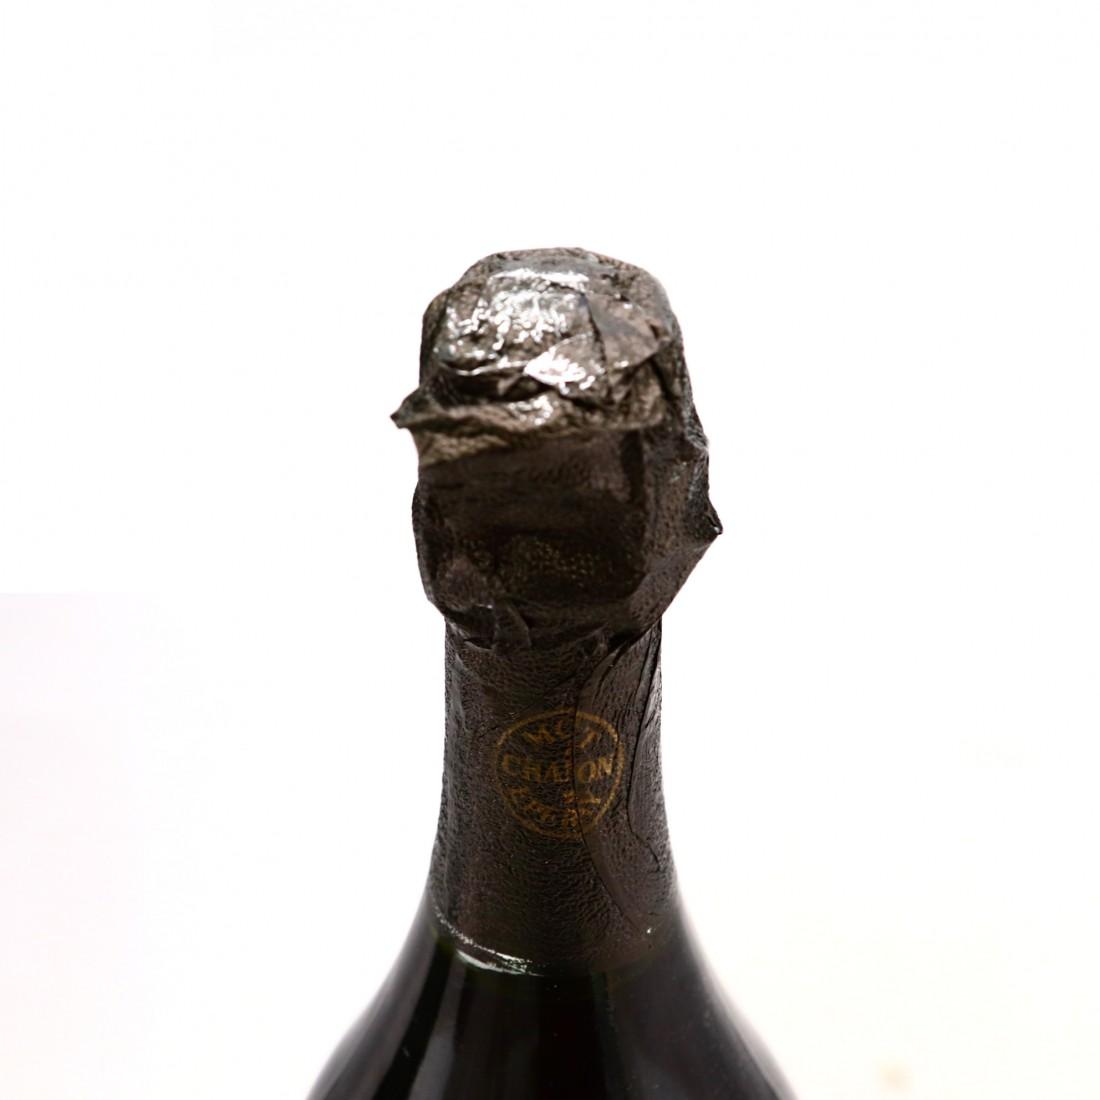 Dom Perignon Rose 1980 Vintage Champagne